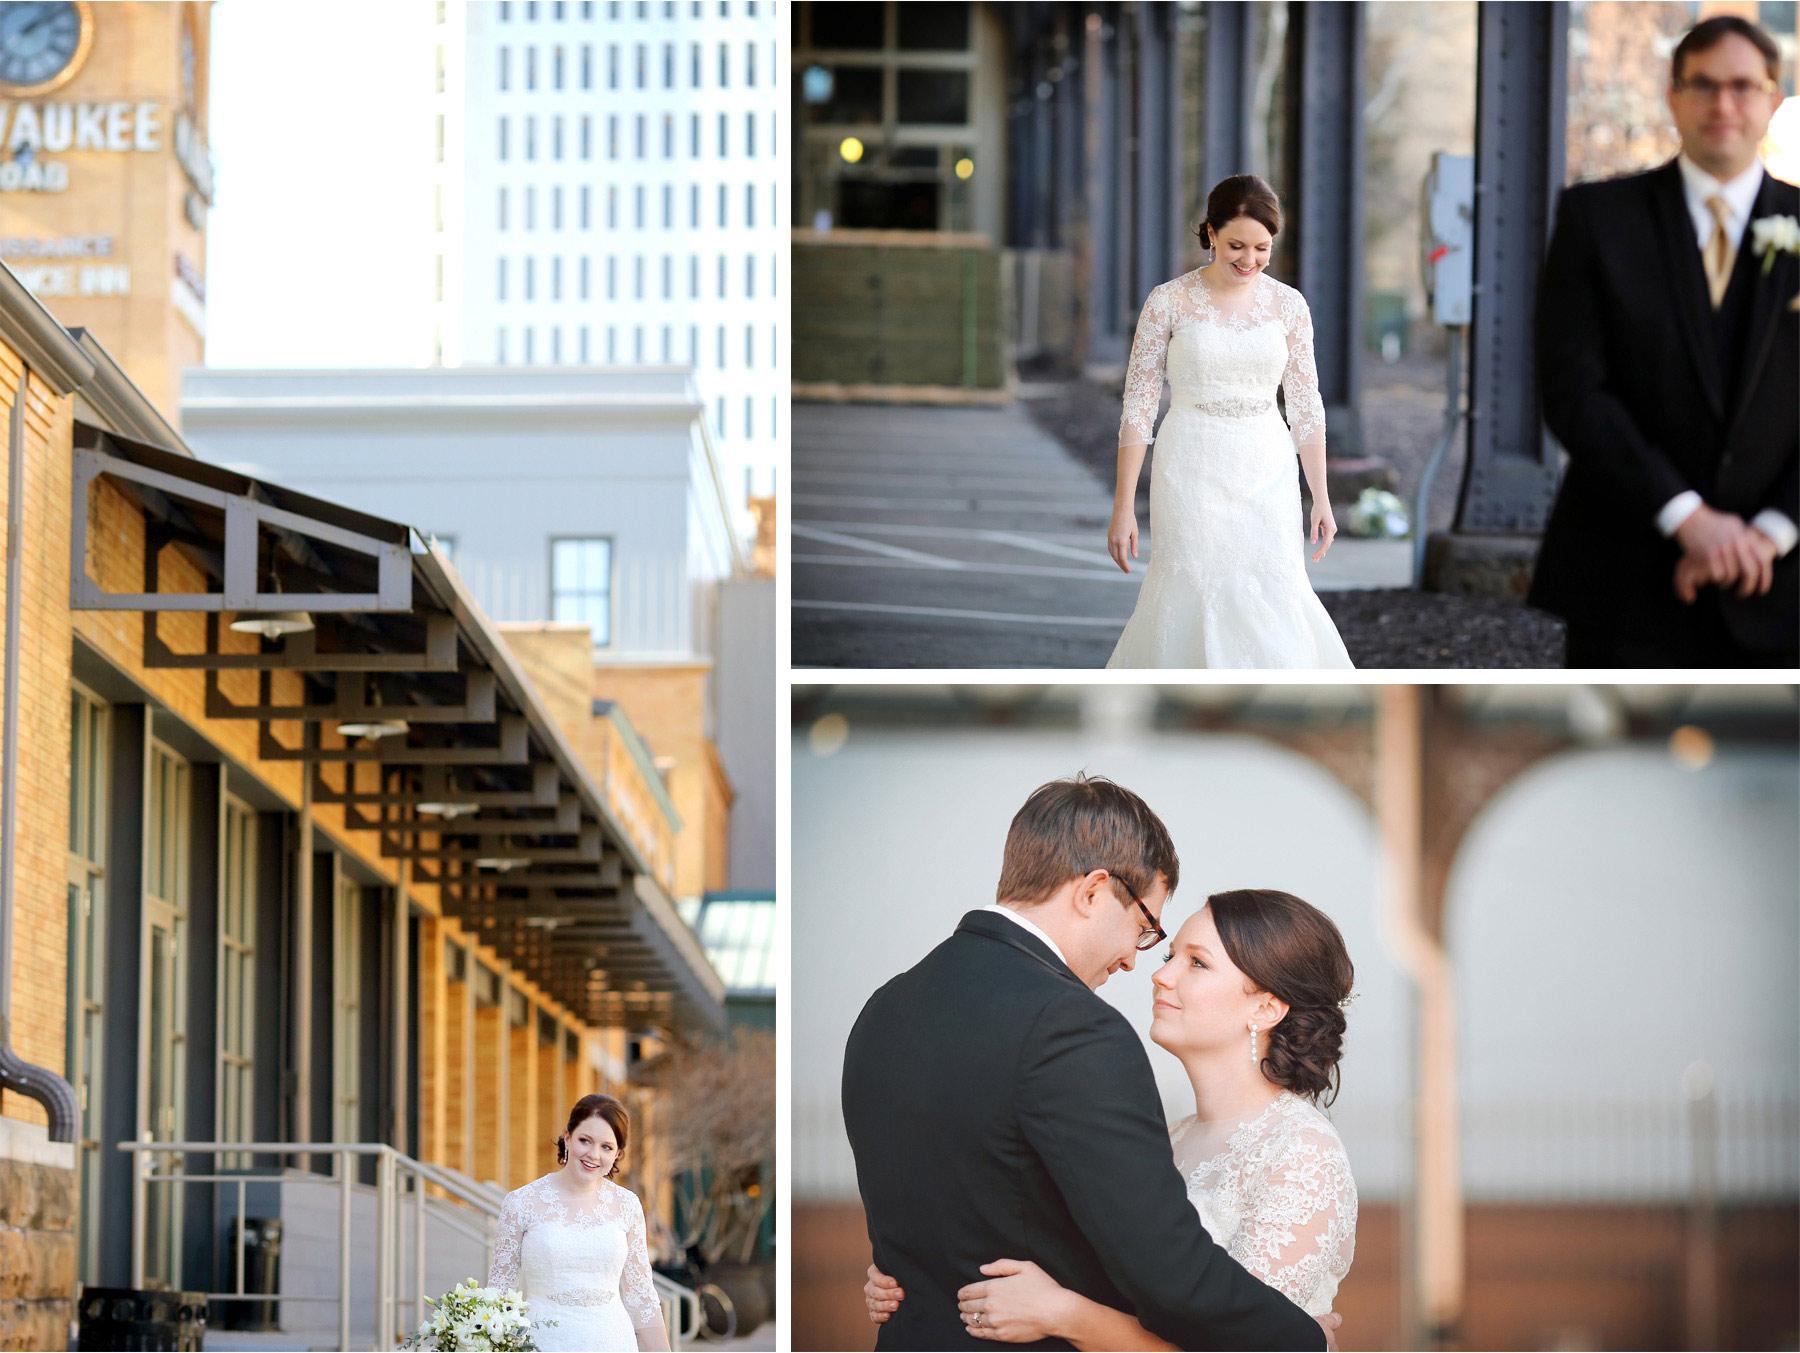 04-Minneapolis-Minnesota-Wedding-Photographer-by-Andrew-Vick-Photography-Winter-Renaissance-Hotel-First-Meeting-Look-Bride-Groom-Depot-Vintage-Sara-and-Rob.jpg